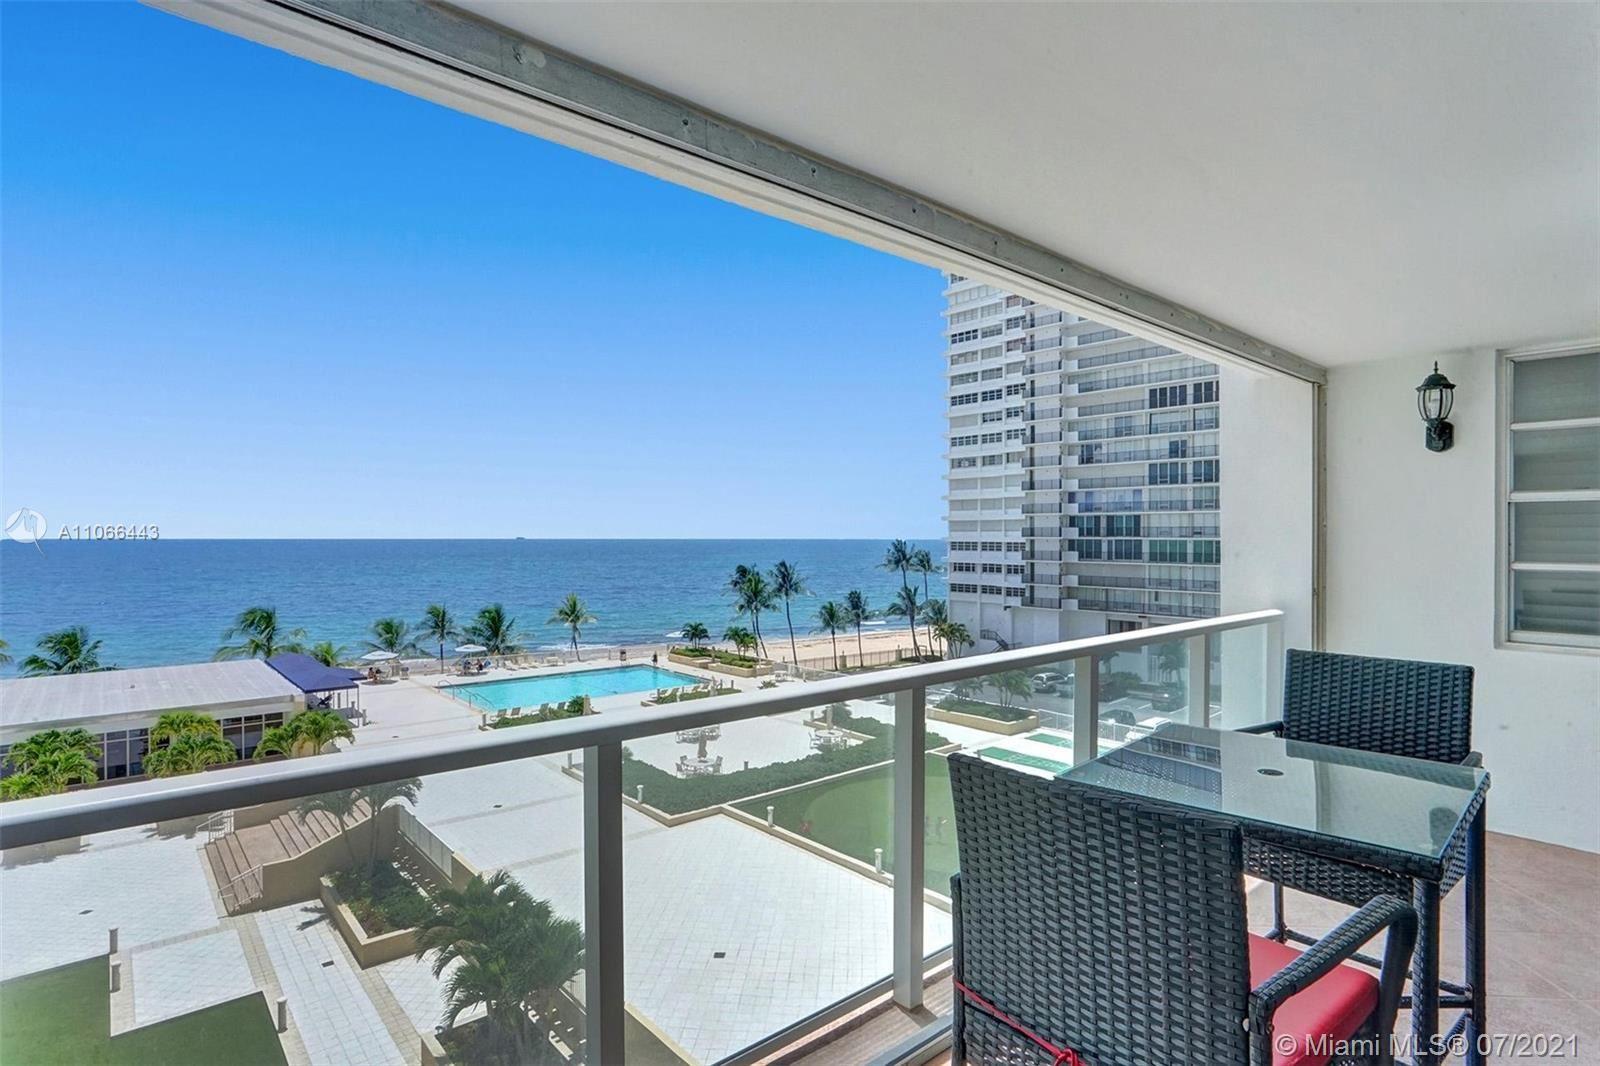 4300 N Ocean Blvd #5D, Fort Lauderdale, FL 33308 - #: A11066443